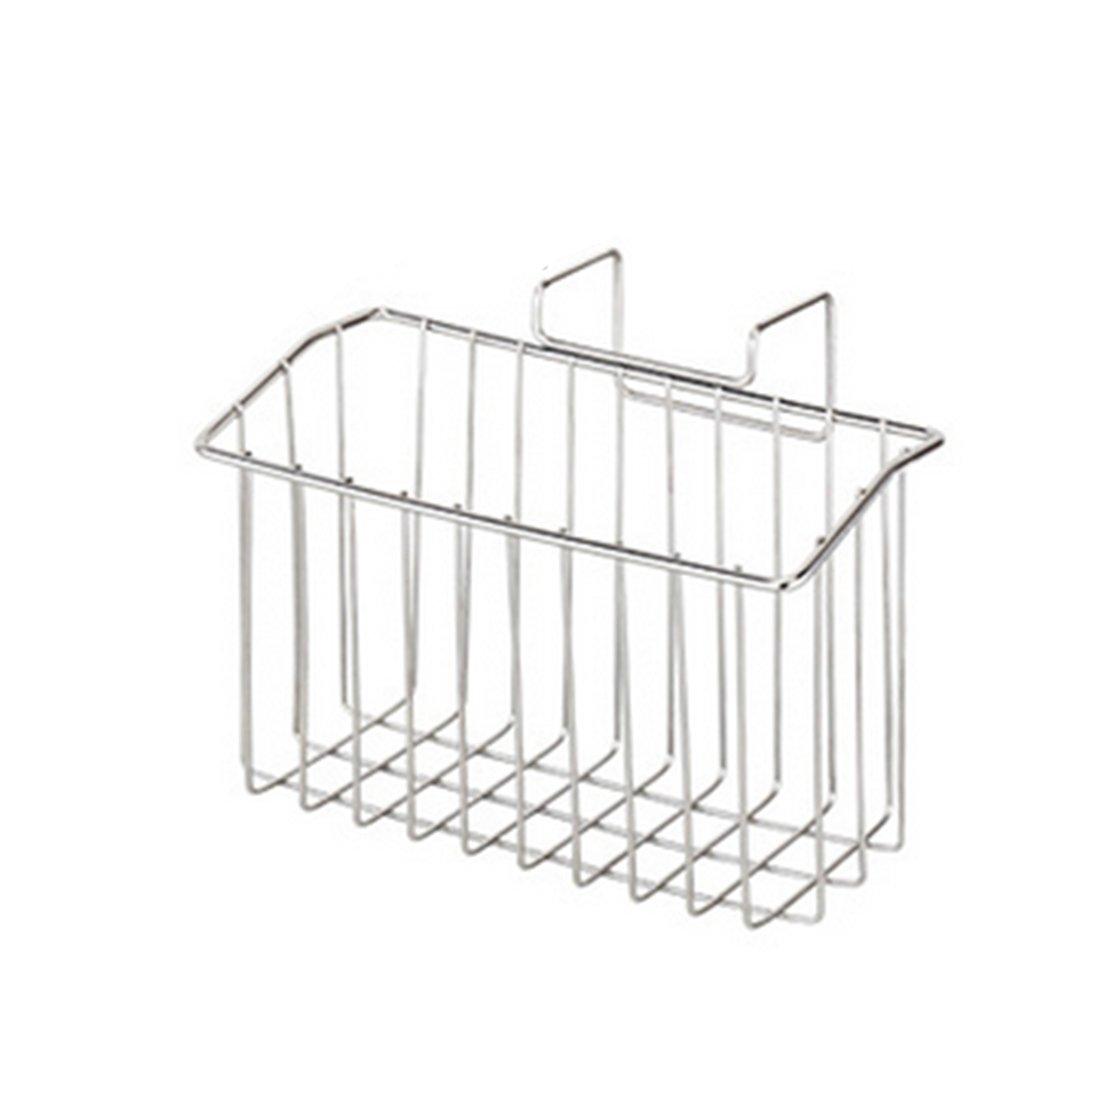 Kitchen Draining Rack,YIFAN Stainless Steel Draining Rack Kitchen Sink Storage Hanging Shelf - Silver by YIFAN